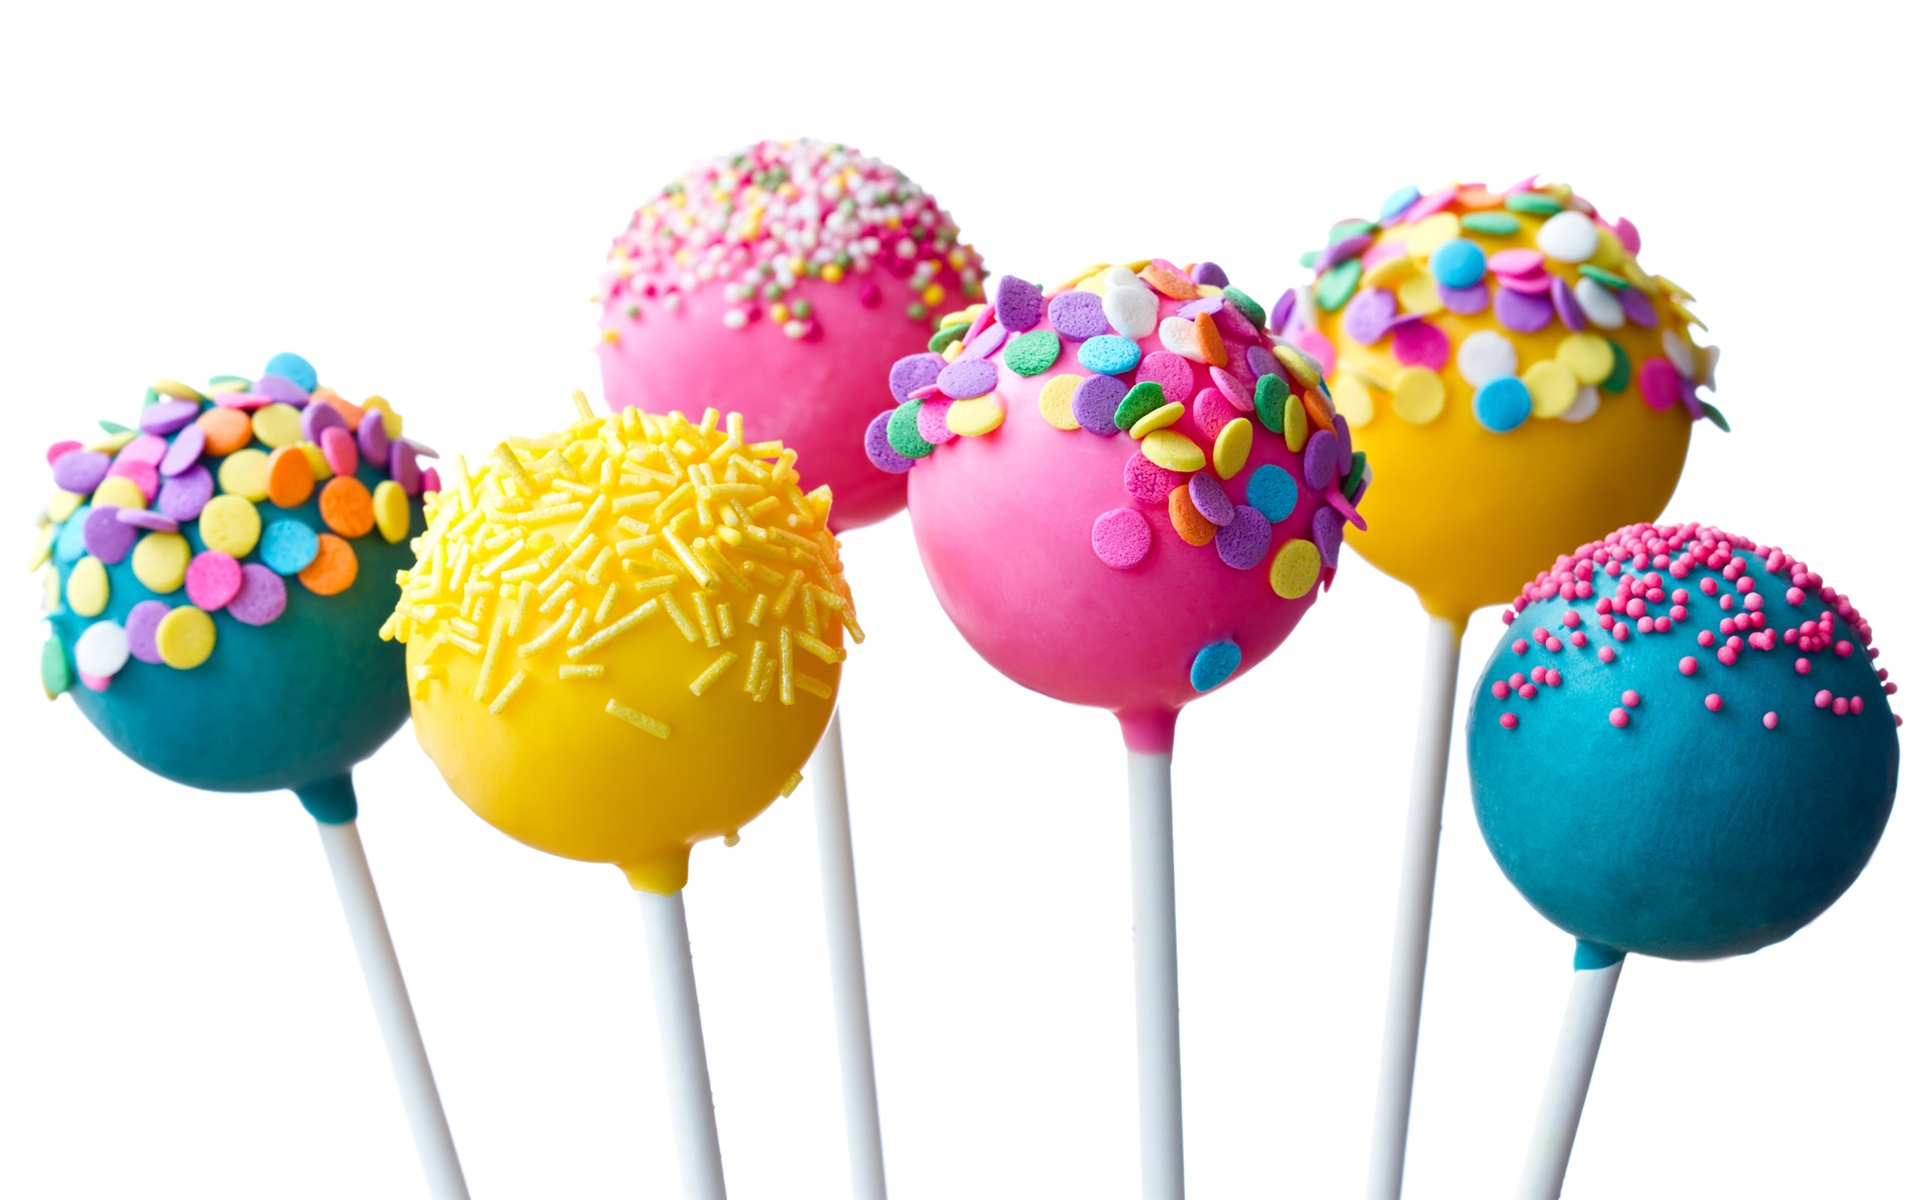 Candy Lollipop Wallpapers 1920x1200